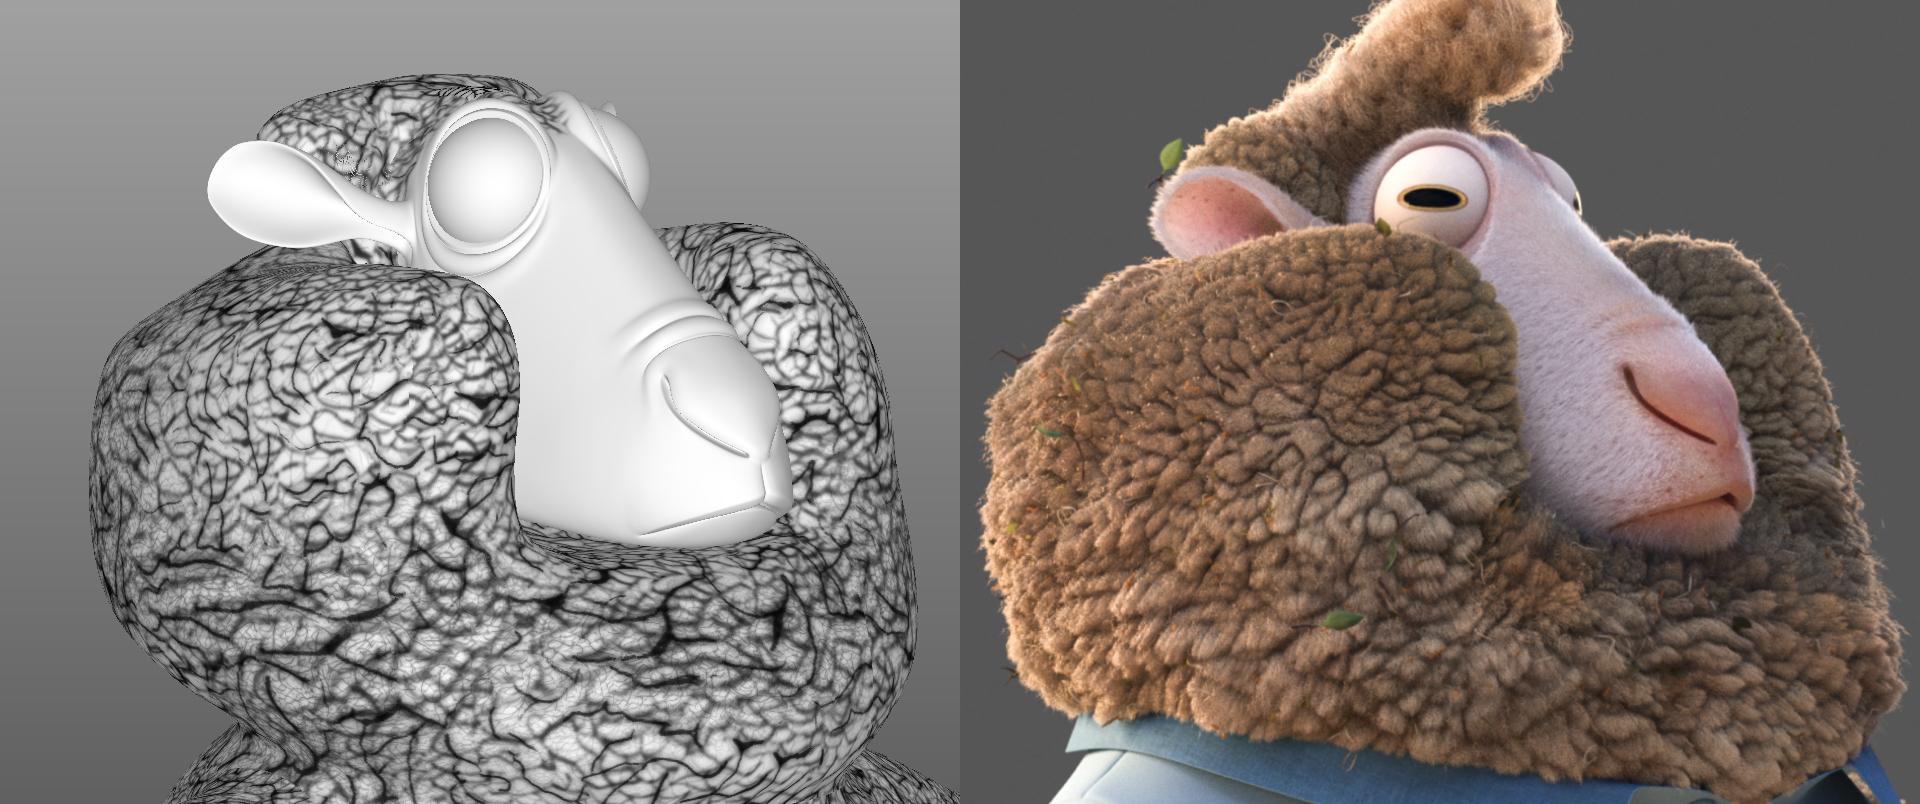 Fur technology makes Zootopia's bunnies believable